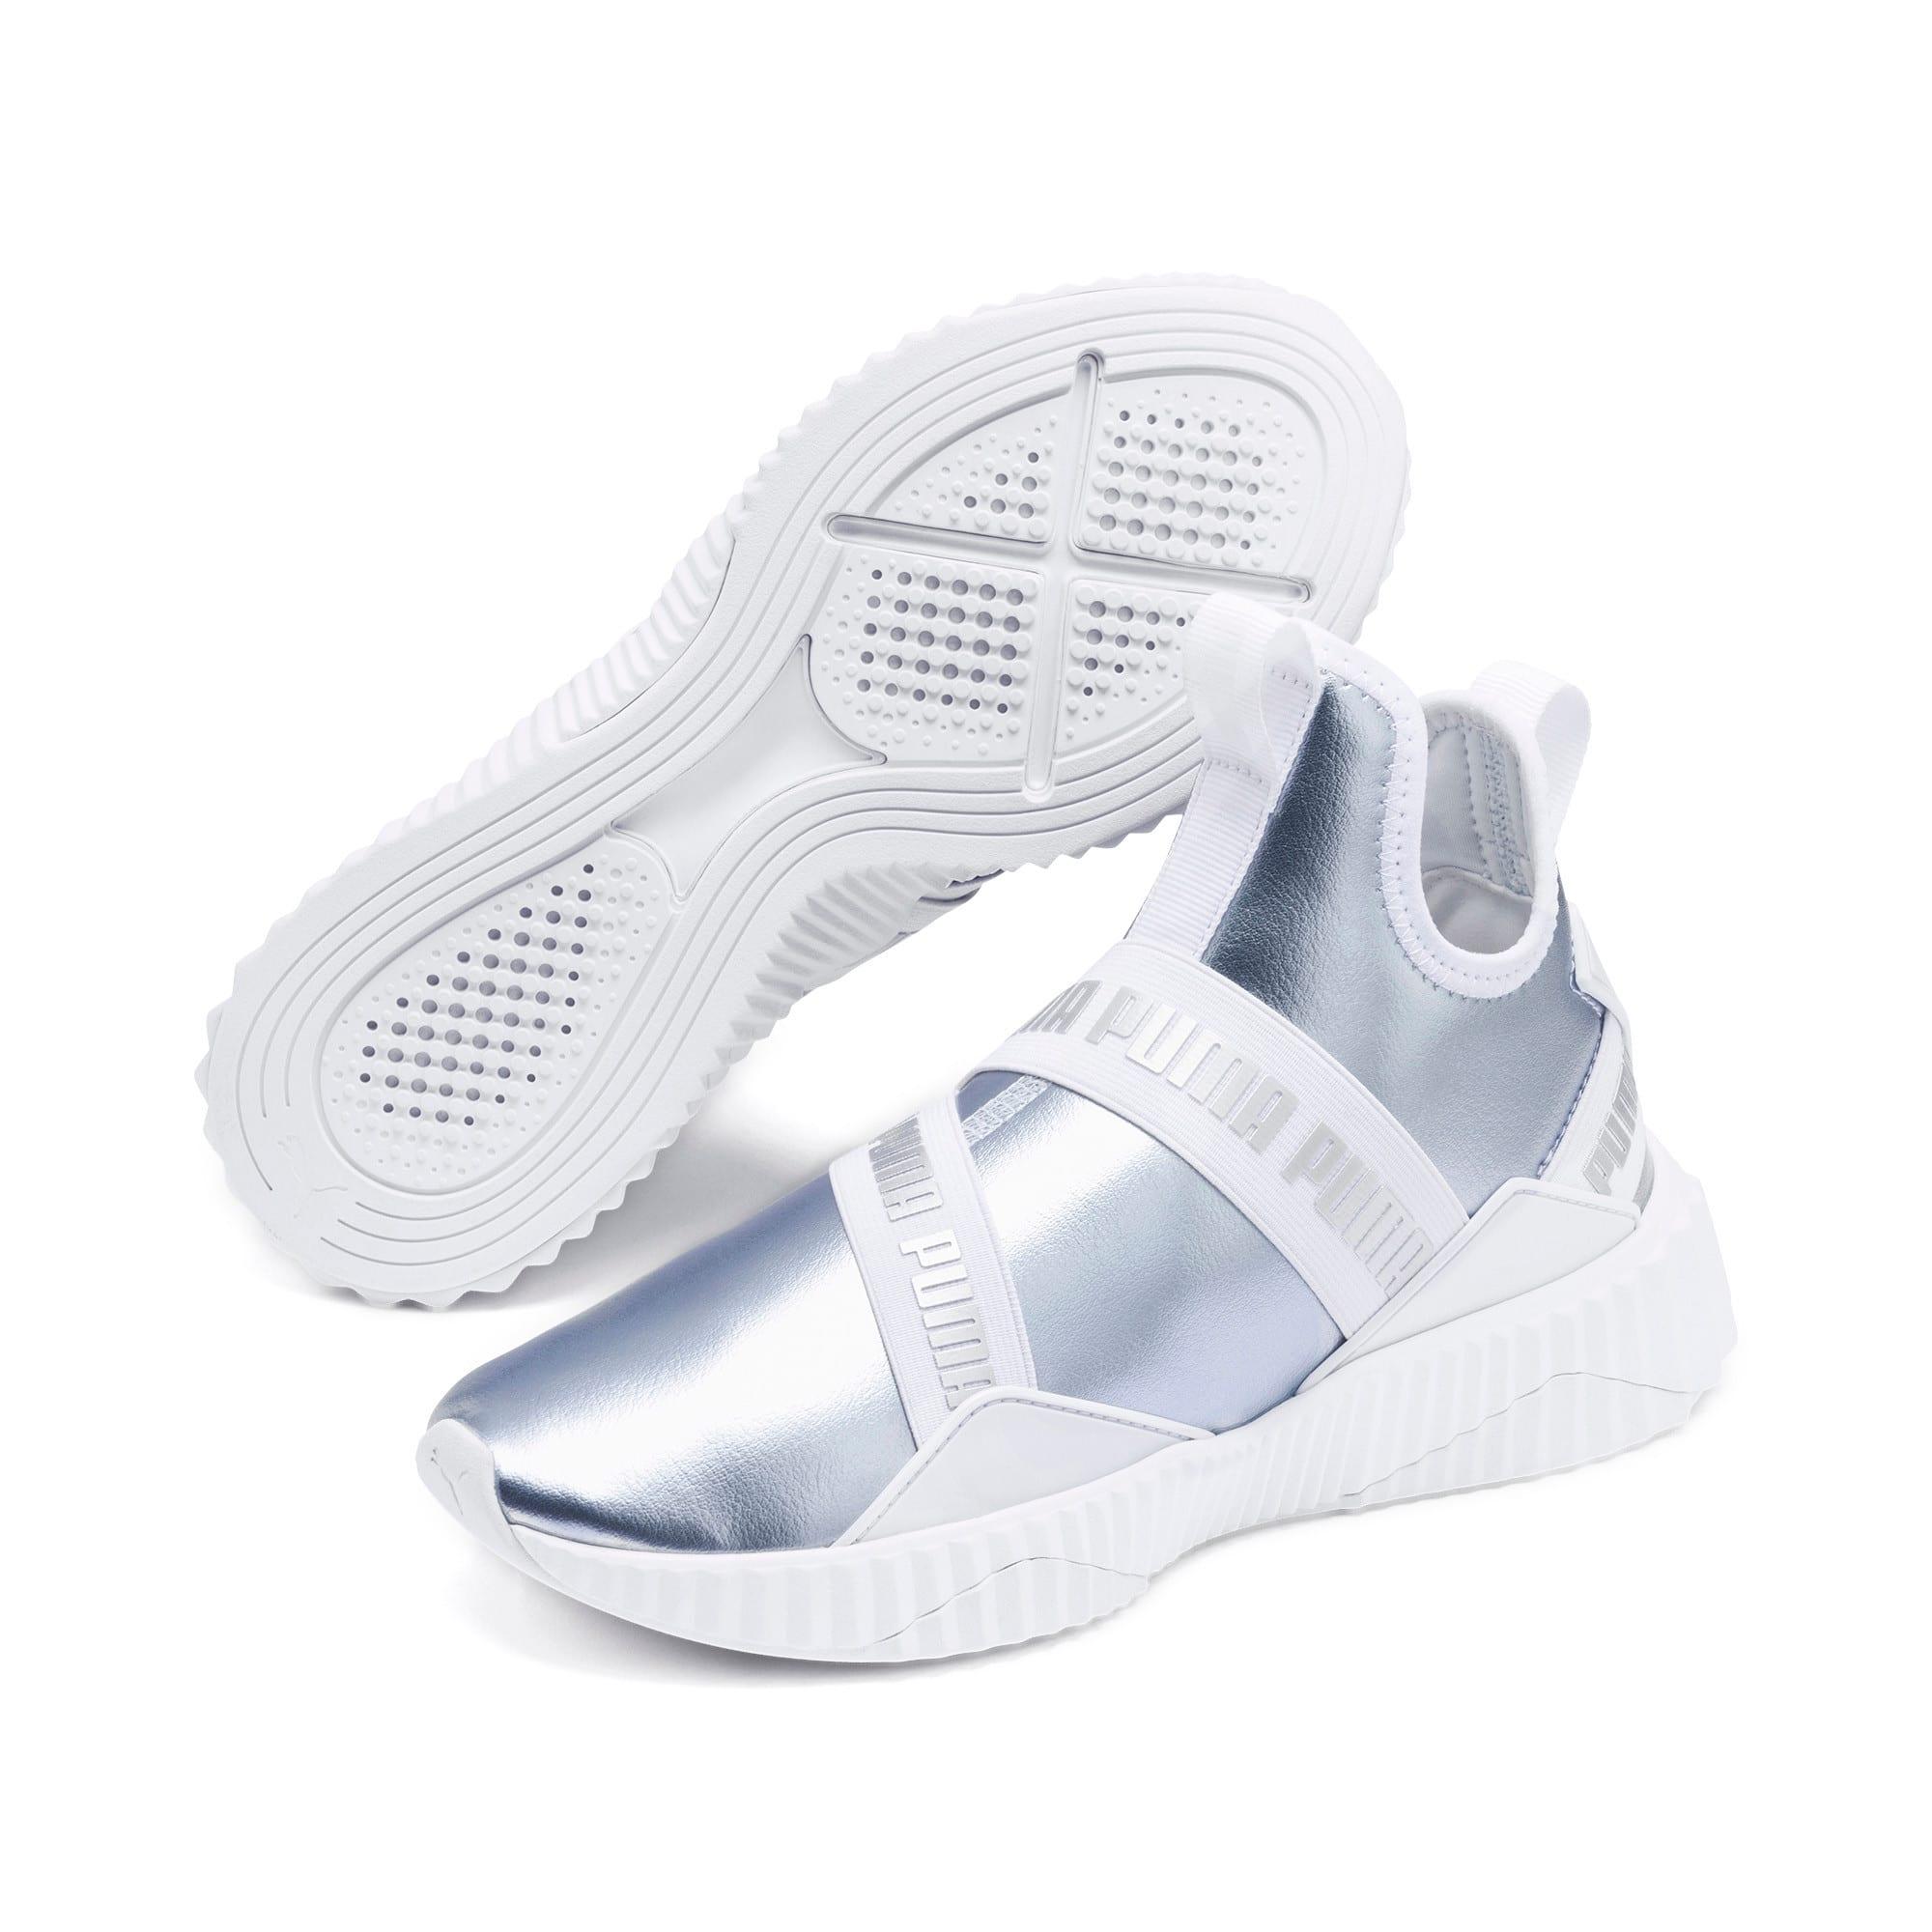 Thumbnail 2 of Defy Mid Metallic Women's Training Shoes, Heather-Puma White, medium